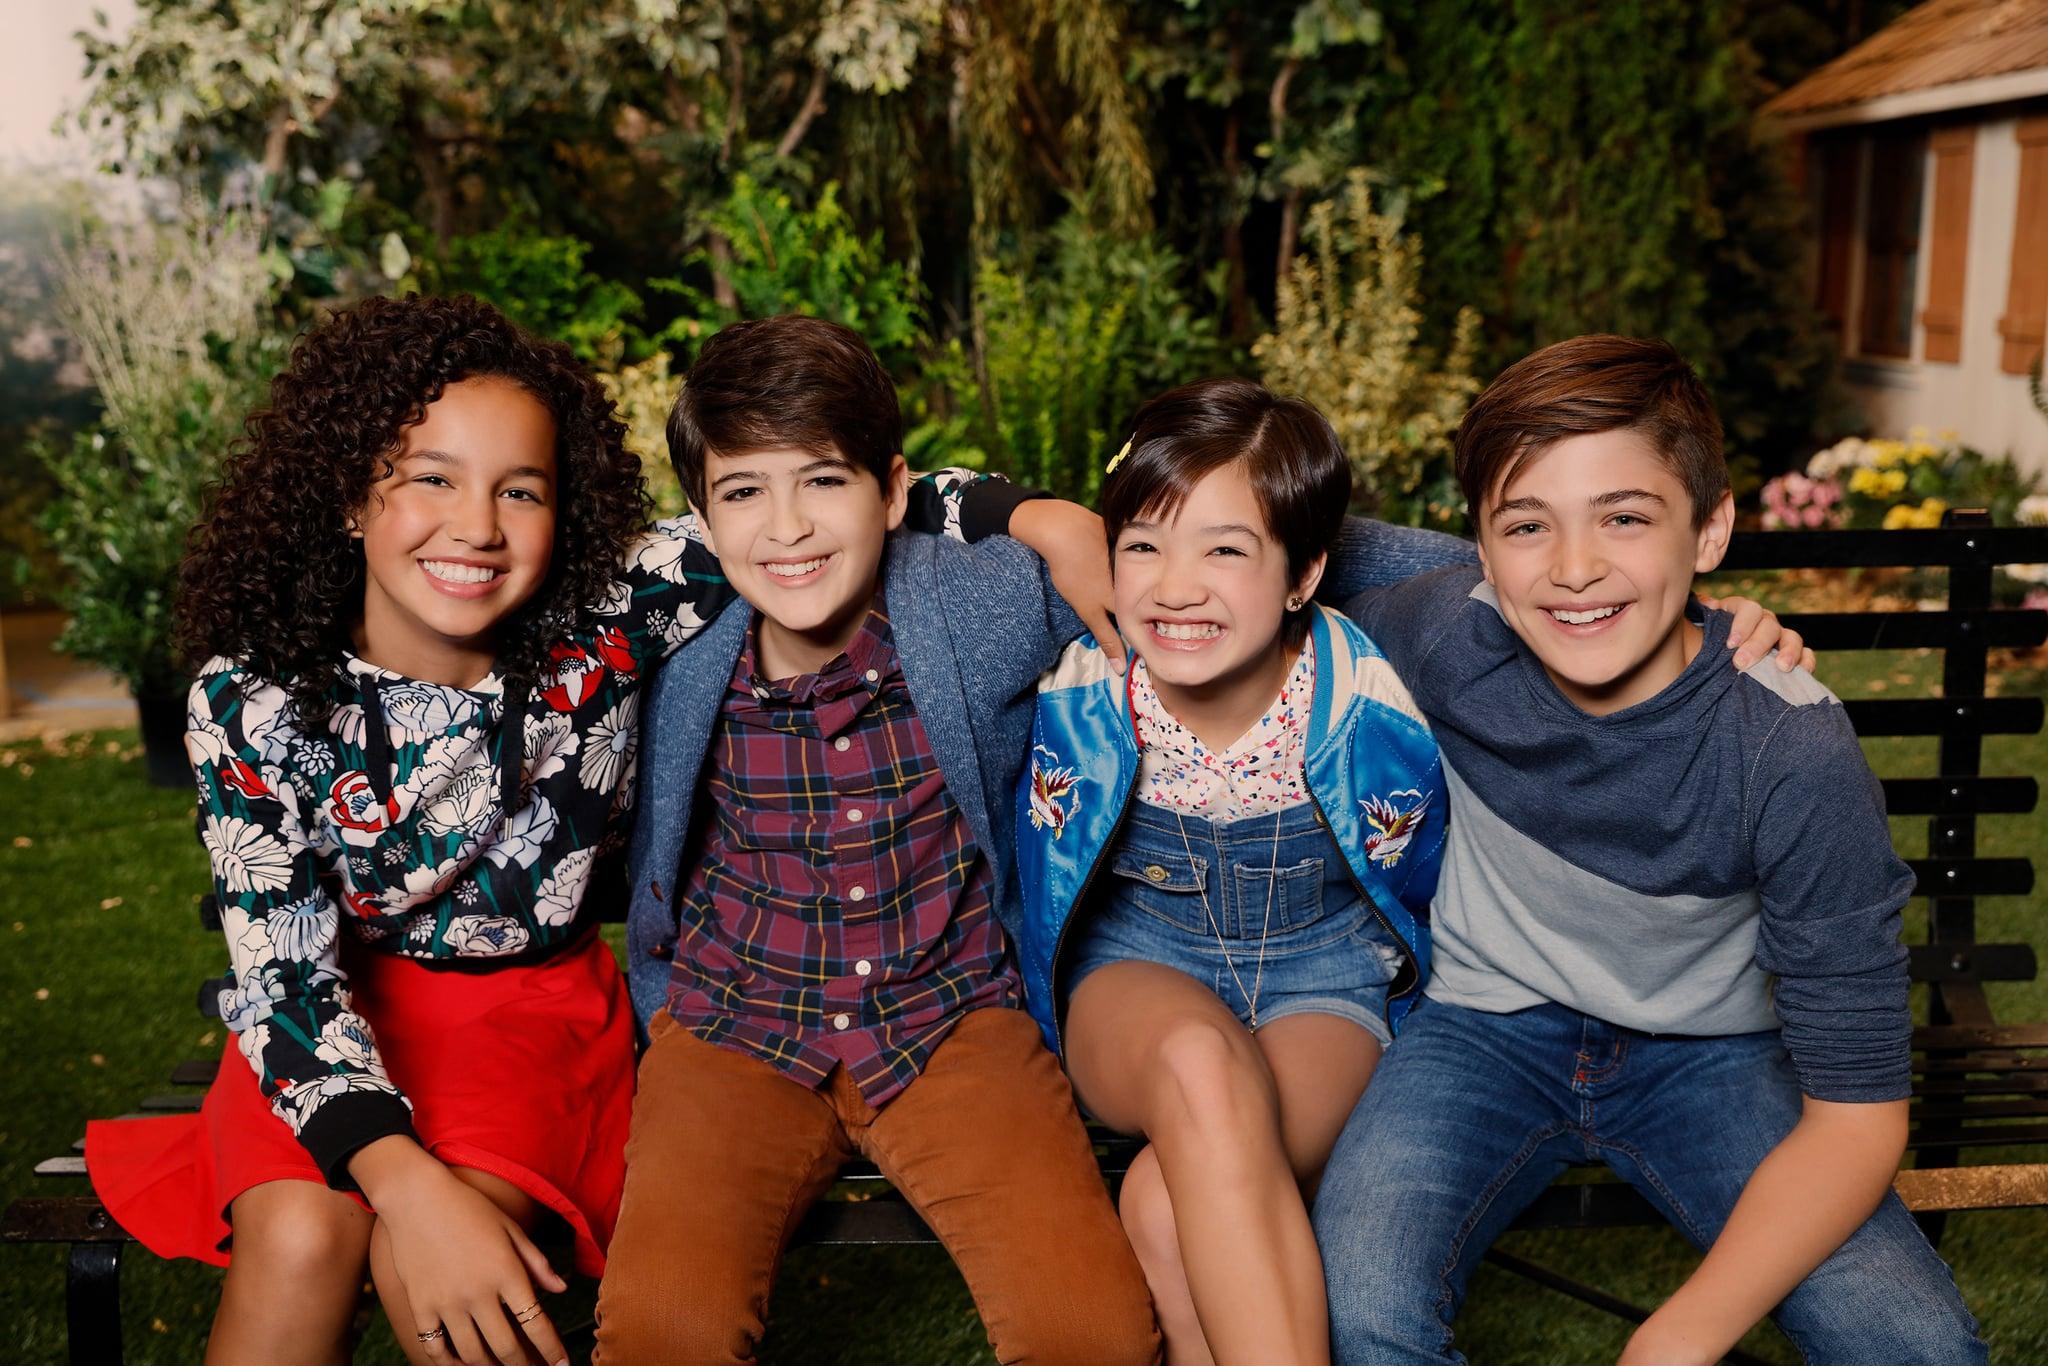 ANDI MACK, (from left): Sofia Wylie, Joshua Rush, Peyton Elizabeth Lee, Asher Angel, (Season 1, 2017). photo: Craig Sjodin / Disney Channel / courtesy Everett Collection